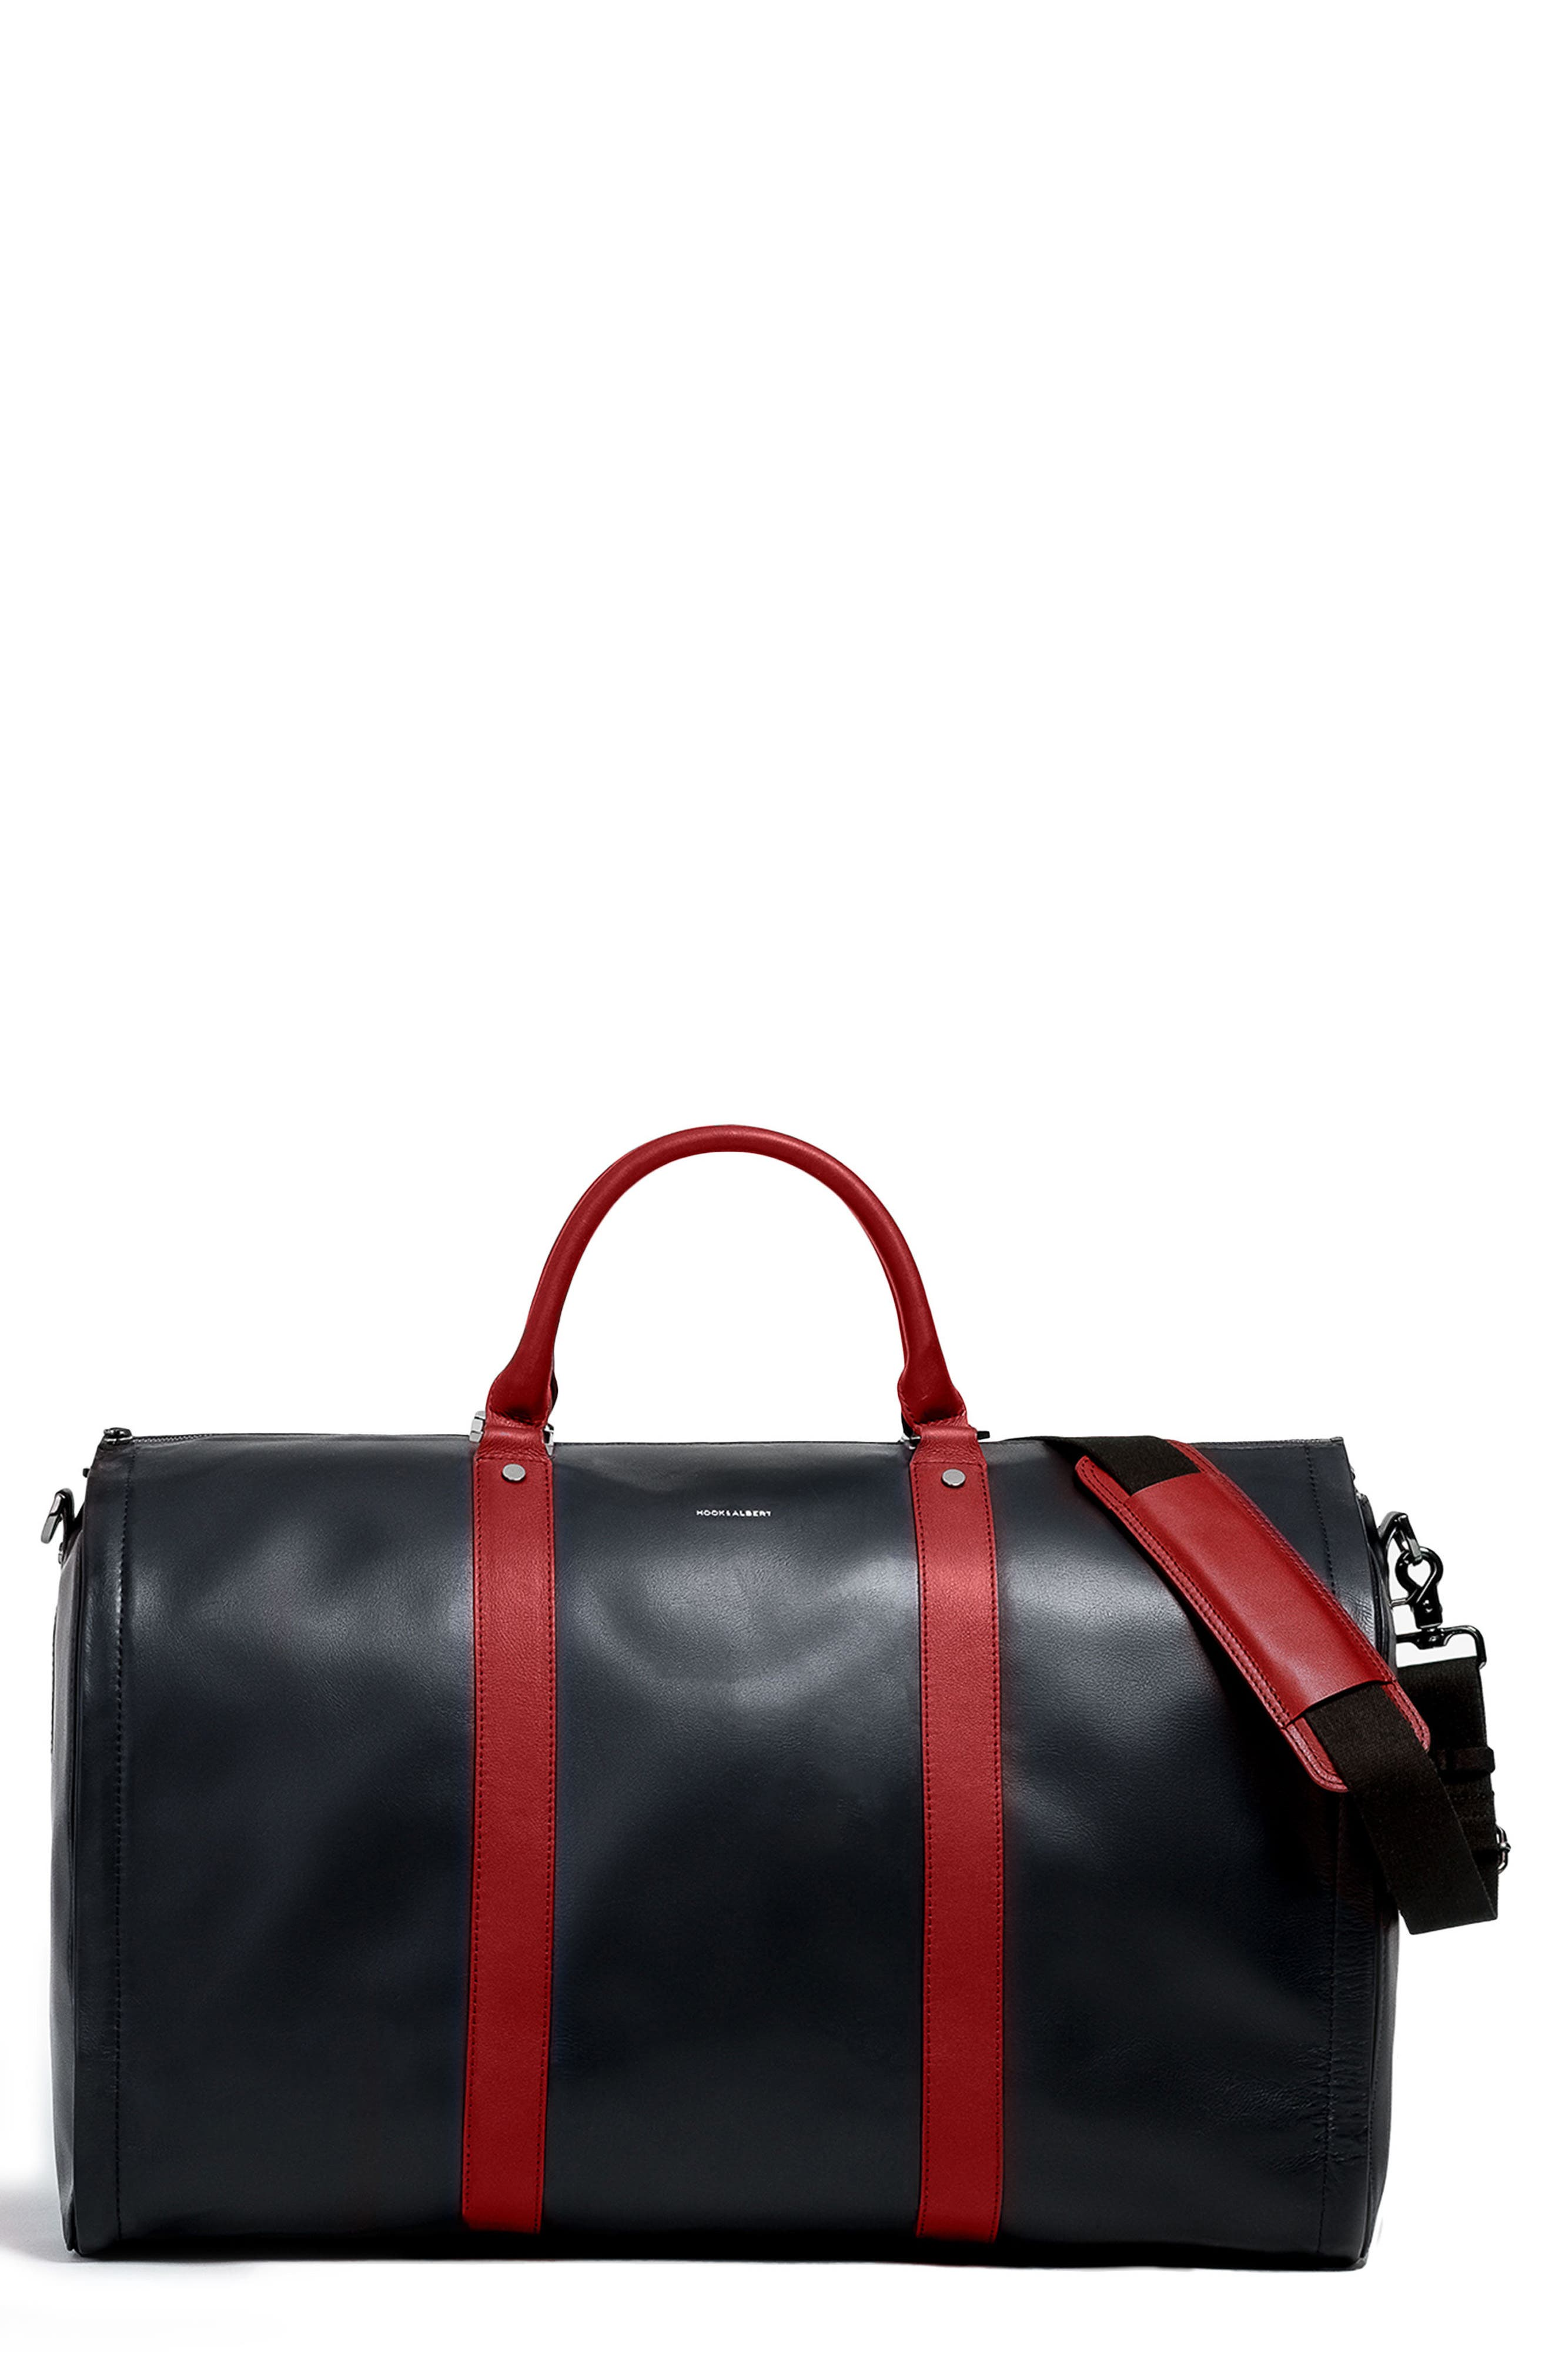 Garment Weekend Bag,                         Main,                         color, Red